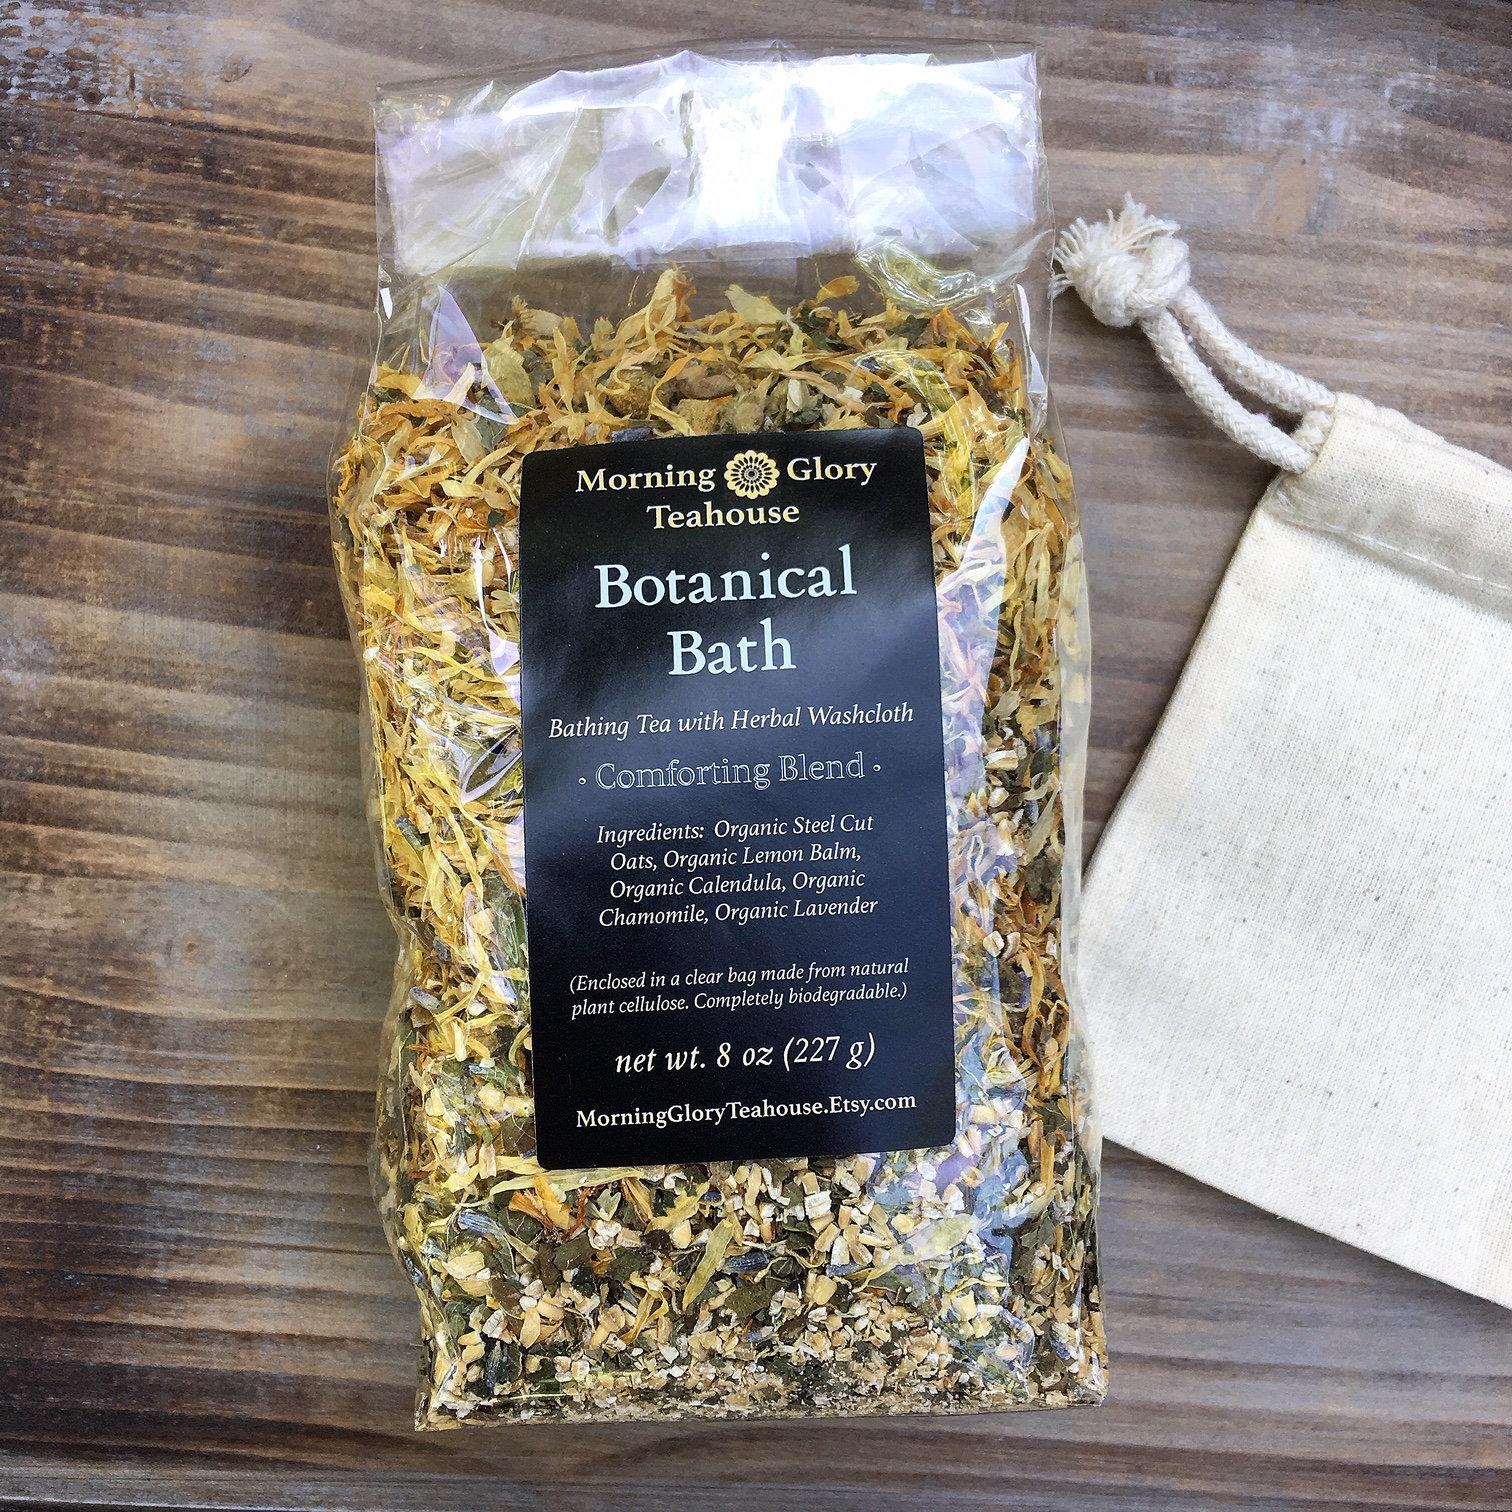 Botanical Bath / Bathing Herbs / Bathing Tea with Herbal